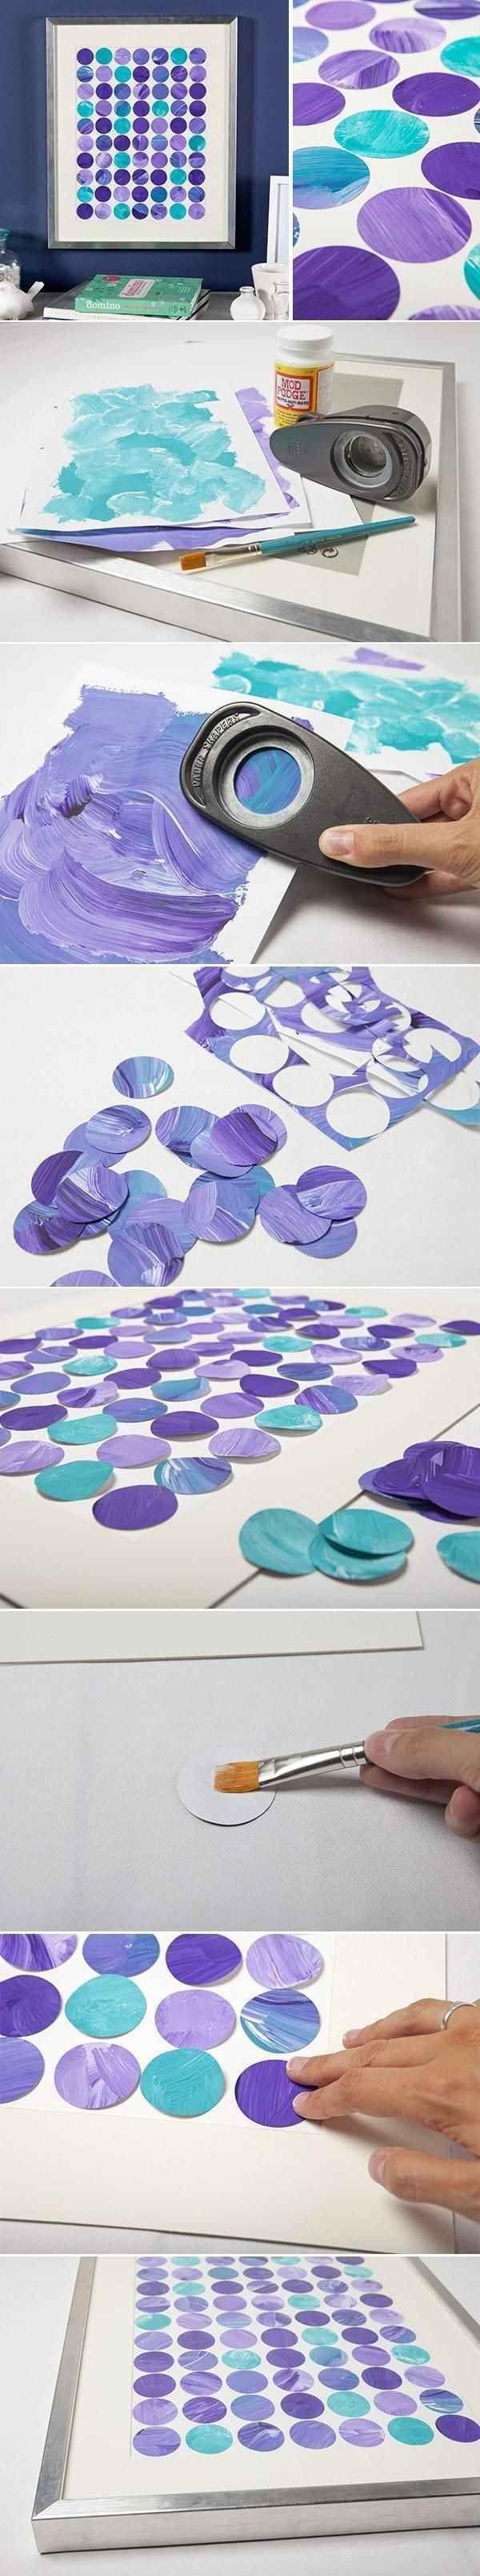 diy wall art made of circles that will make your walls pop!